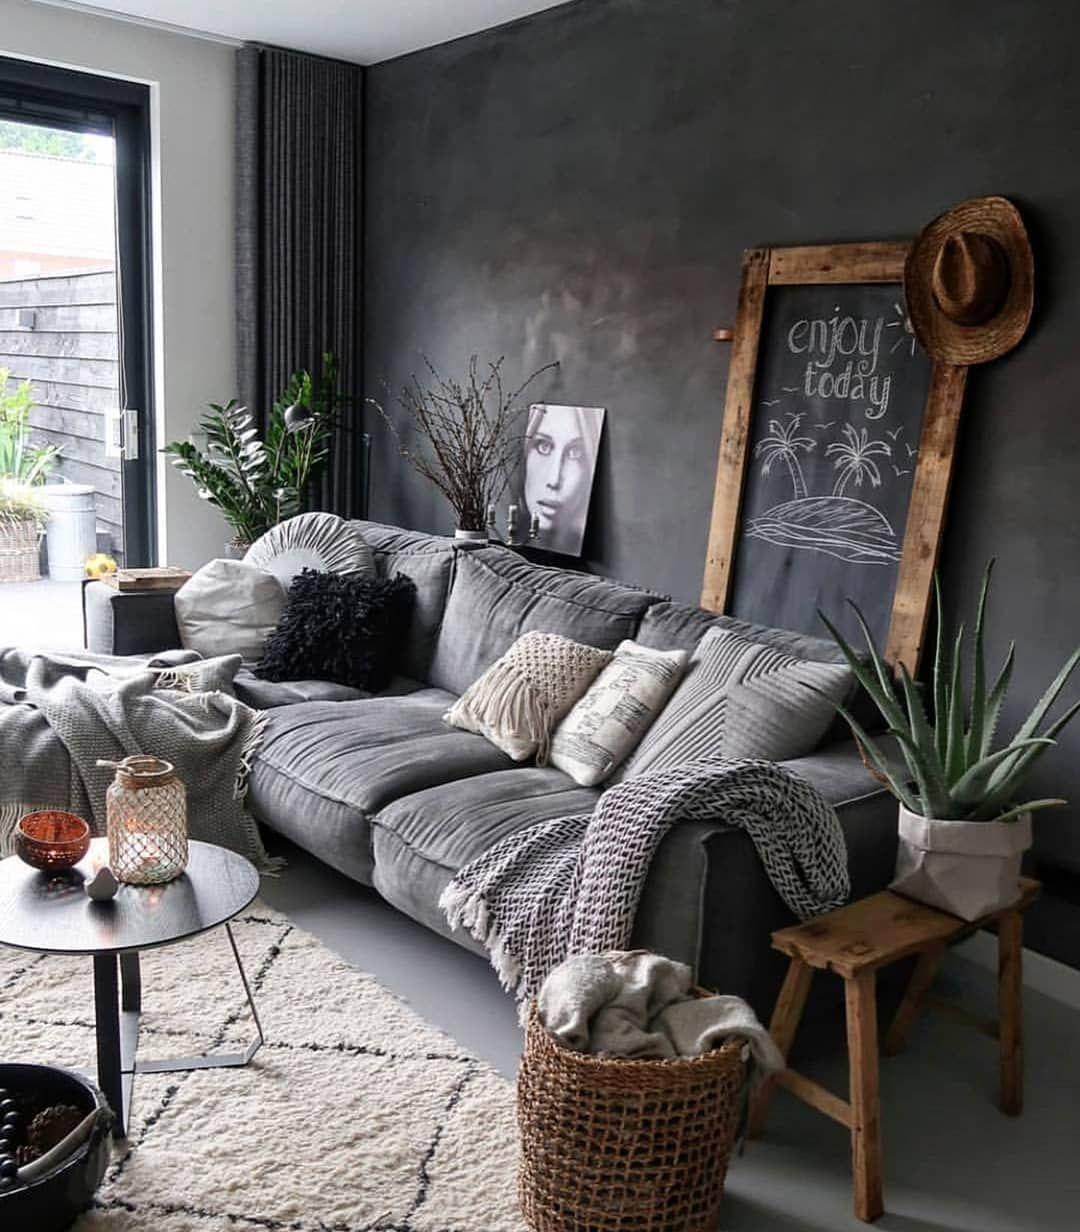 Konsept Works on Instagram: All about grey!  Design by @huizedop . . #design #designer #tasarım #evdekorasyonu #evdekor #natural #doğal #gri #grey #